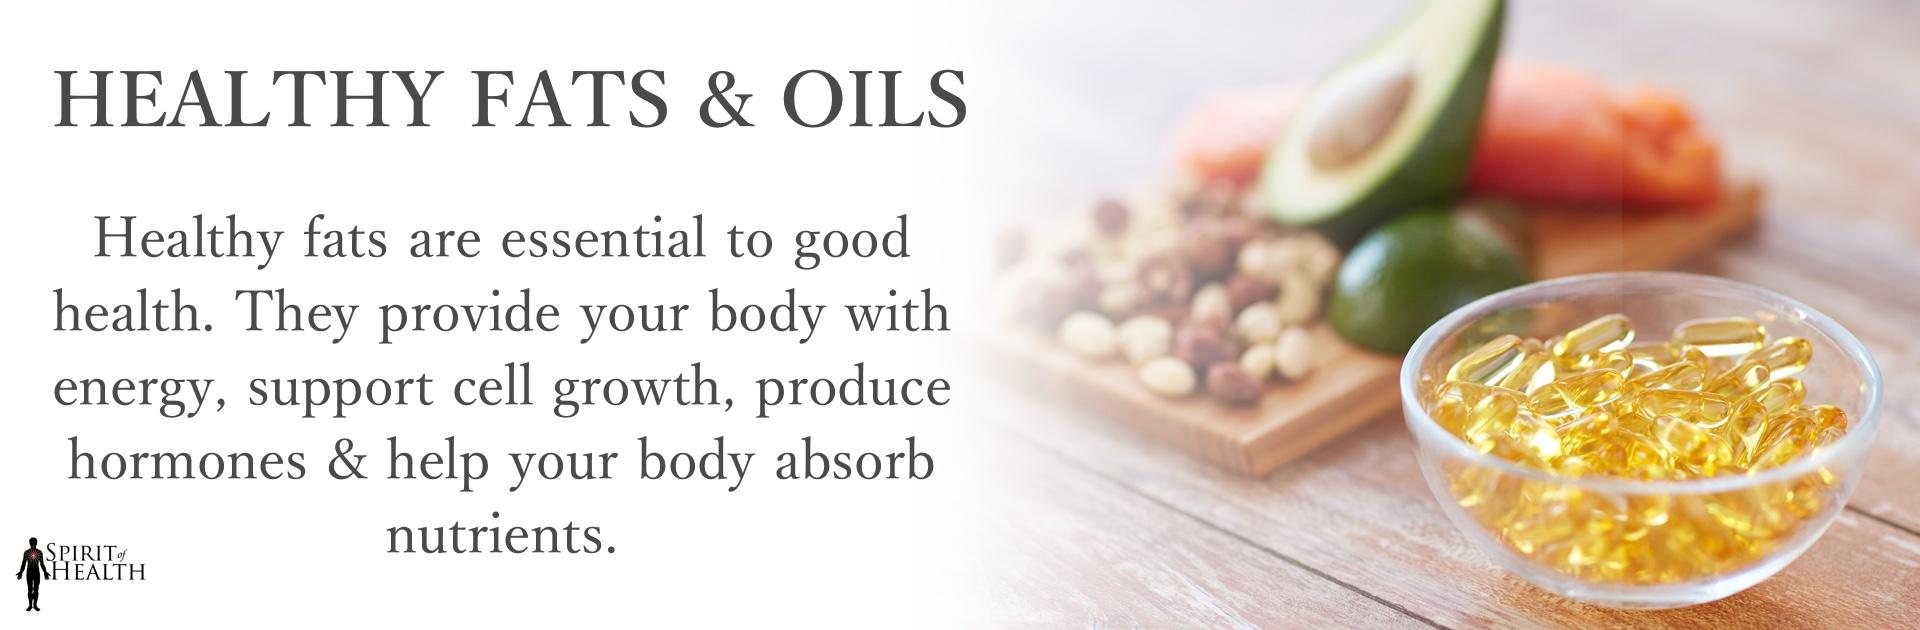 soh-store-banner-healthy-fats-oils2.jpg